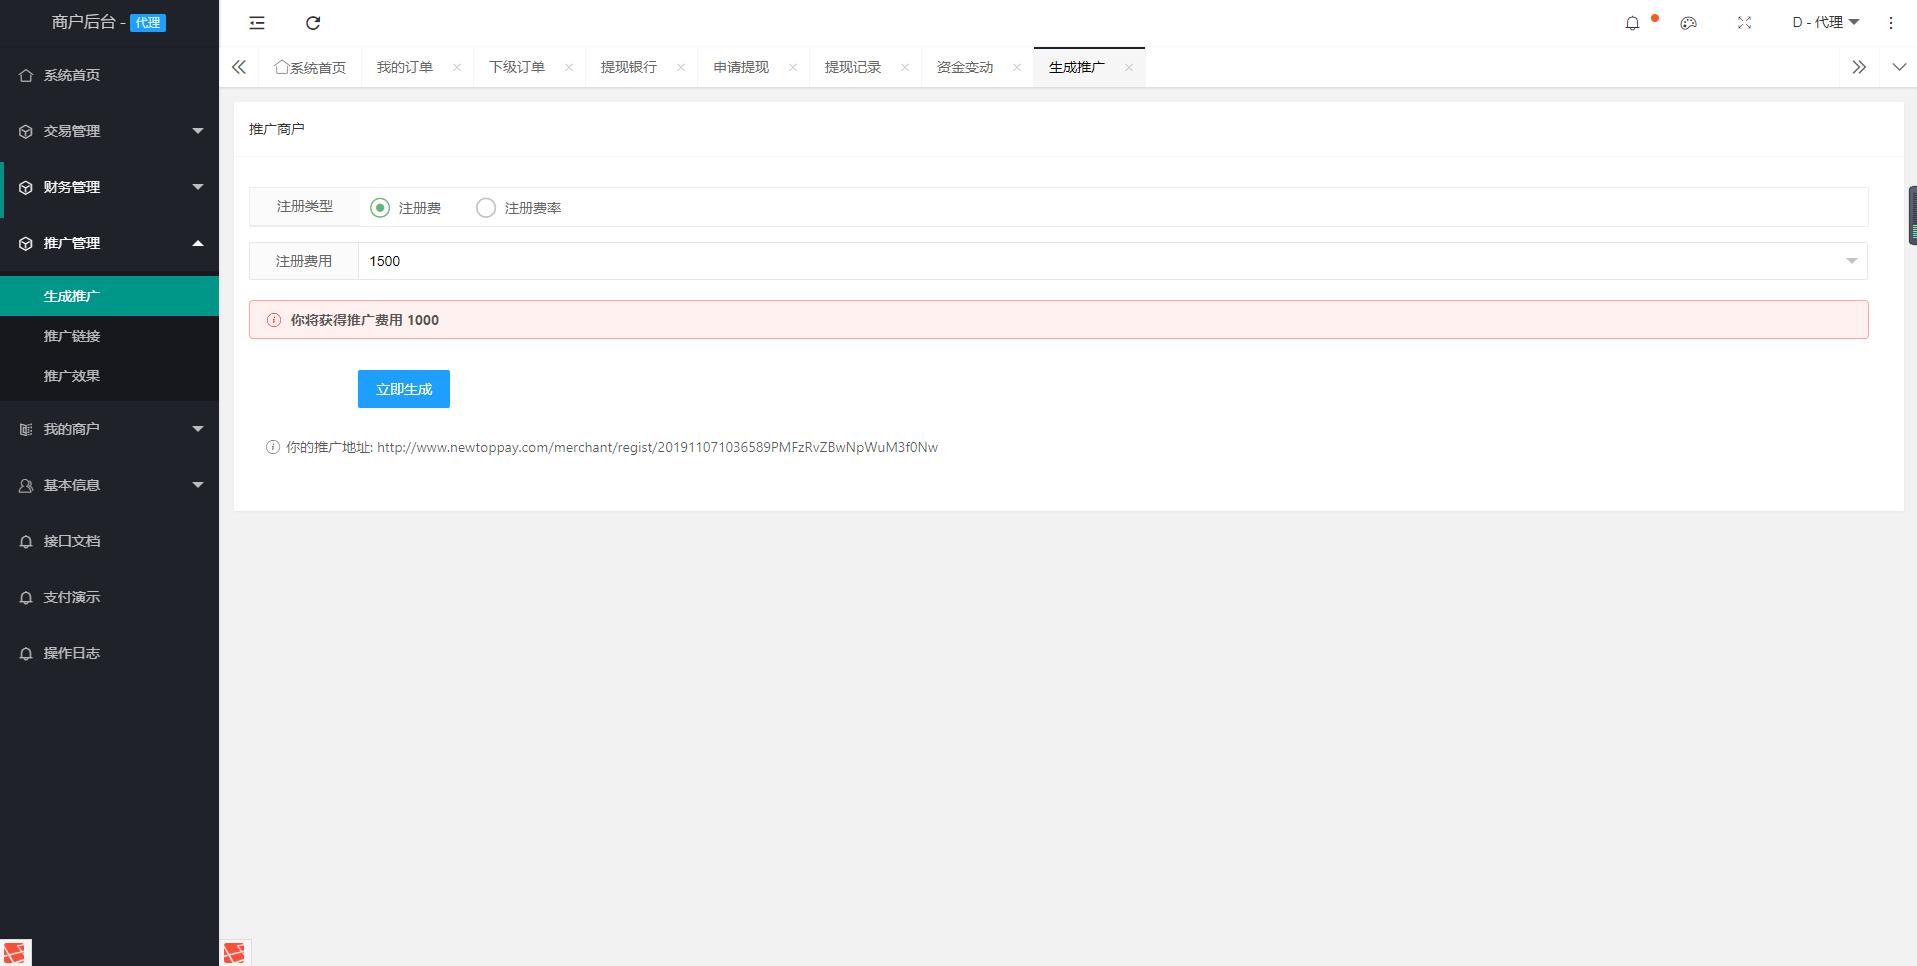 Laravel 支付商户推广生成